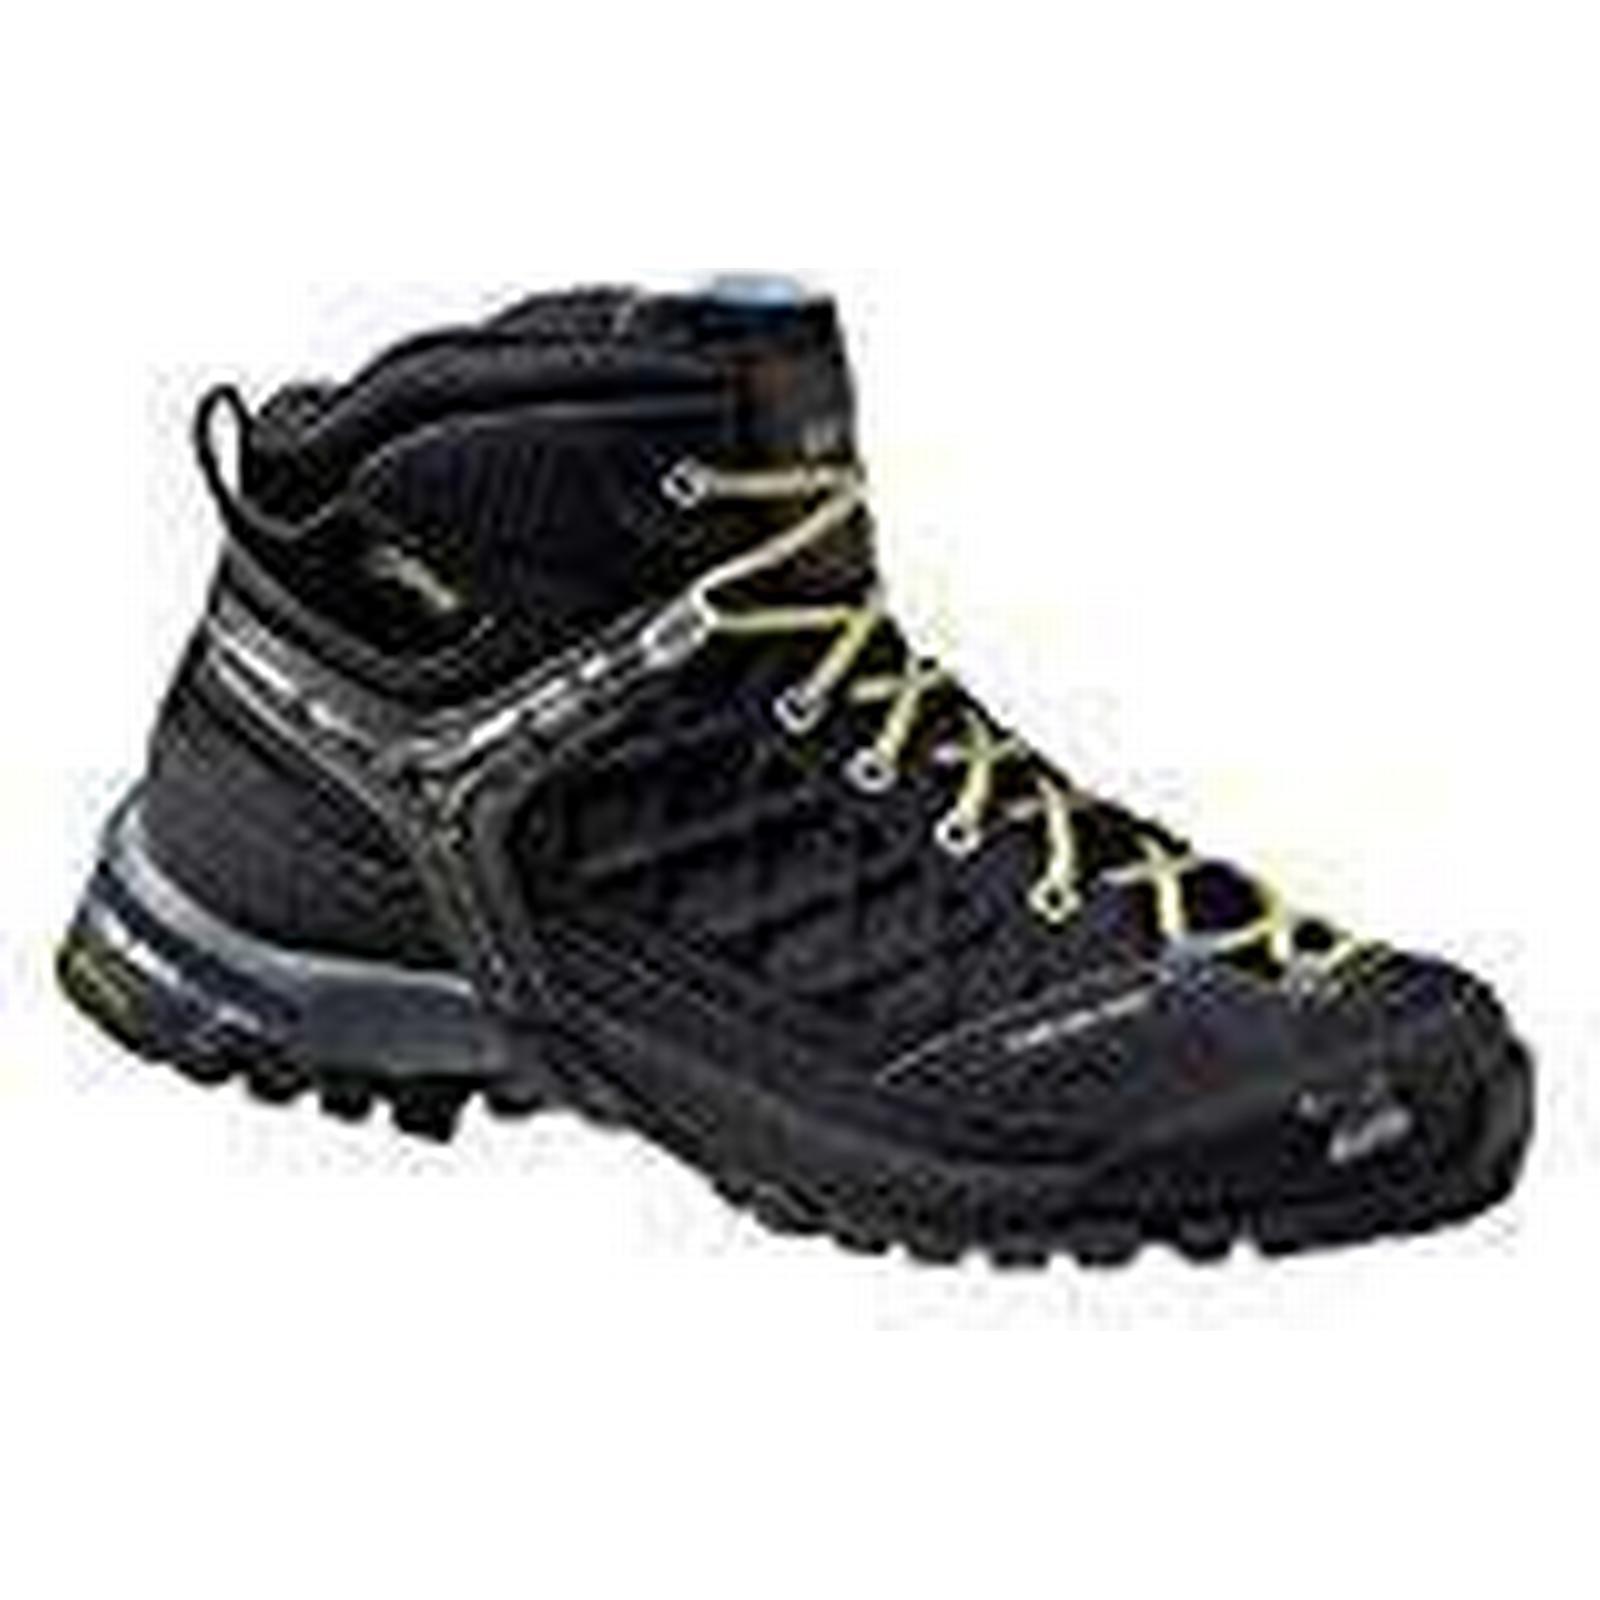 SALEWA Women's WS FIRETAIL EVO MID GTX Hiking 3 shoes, Black (0923 Black/Gneiss), 3 Hiking UK ce3e53